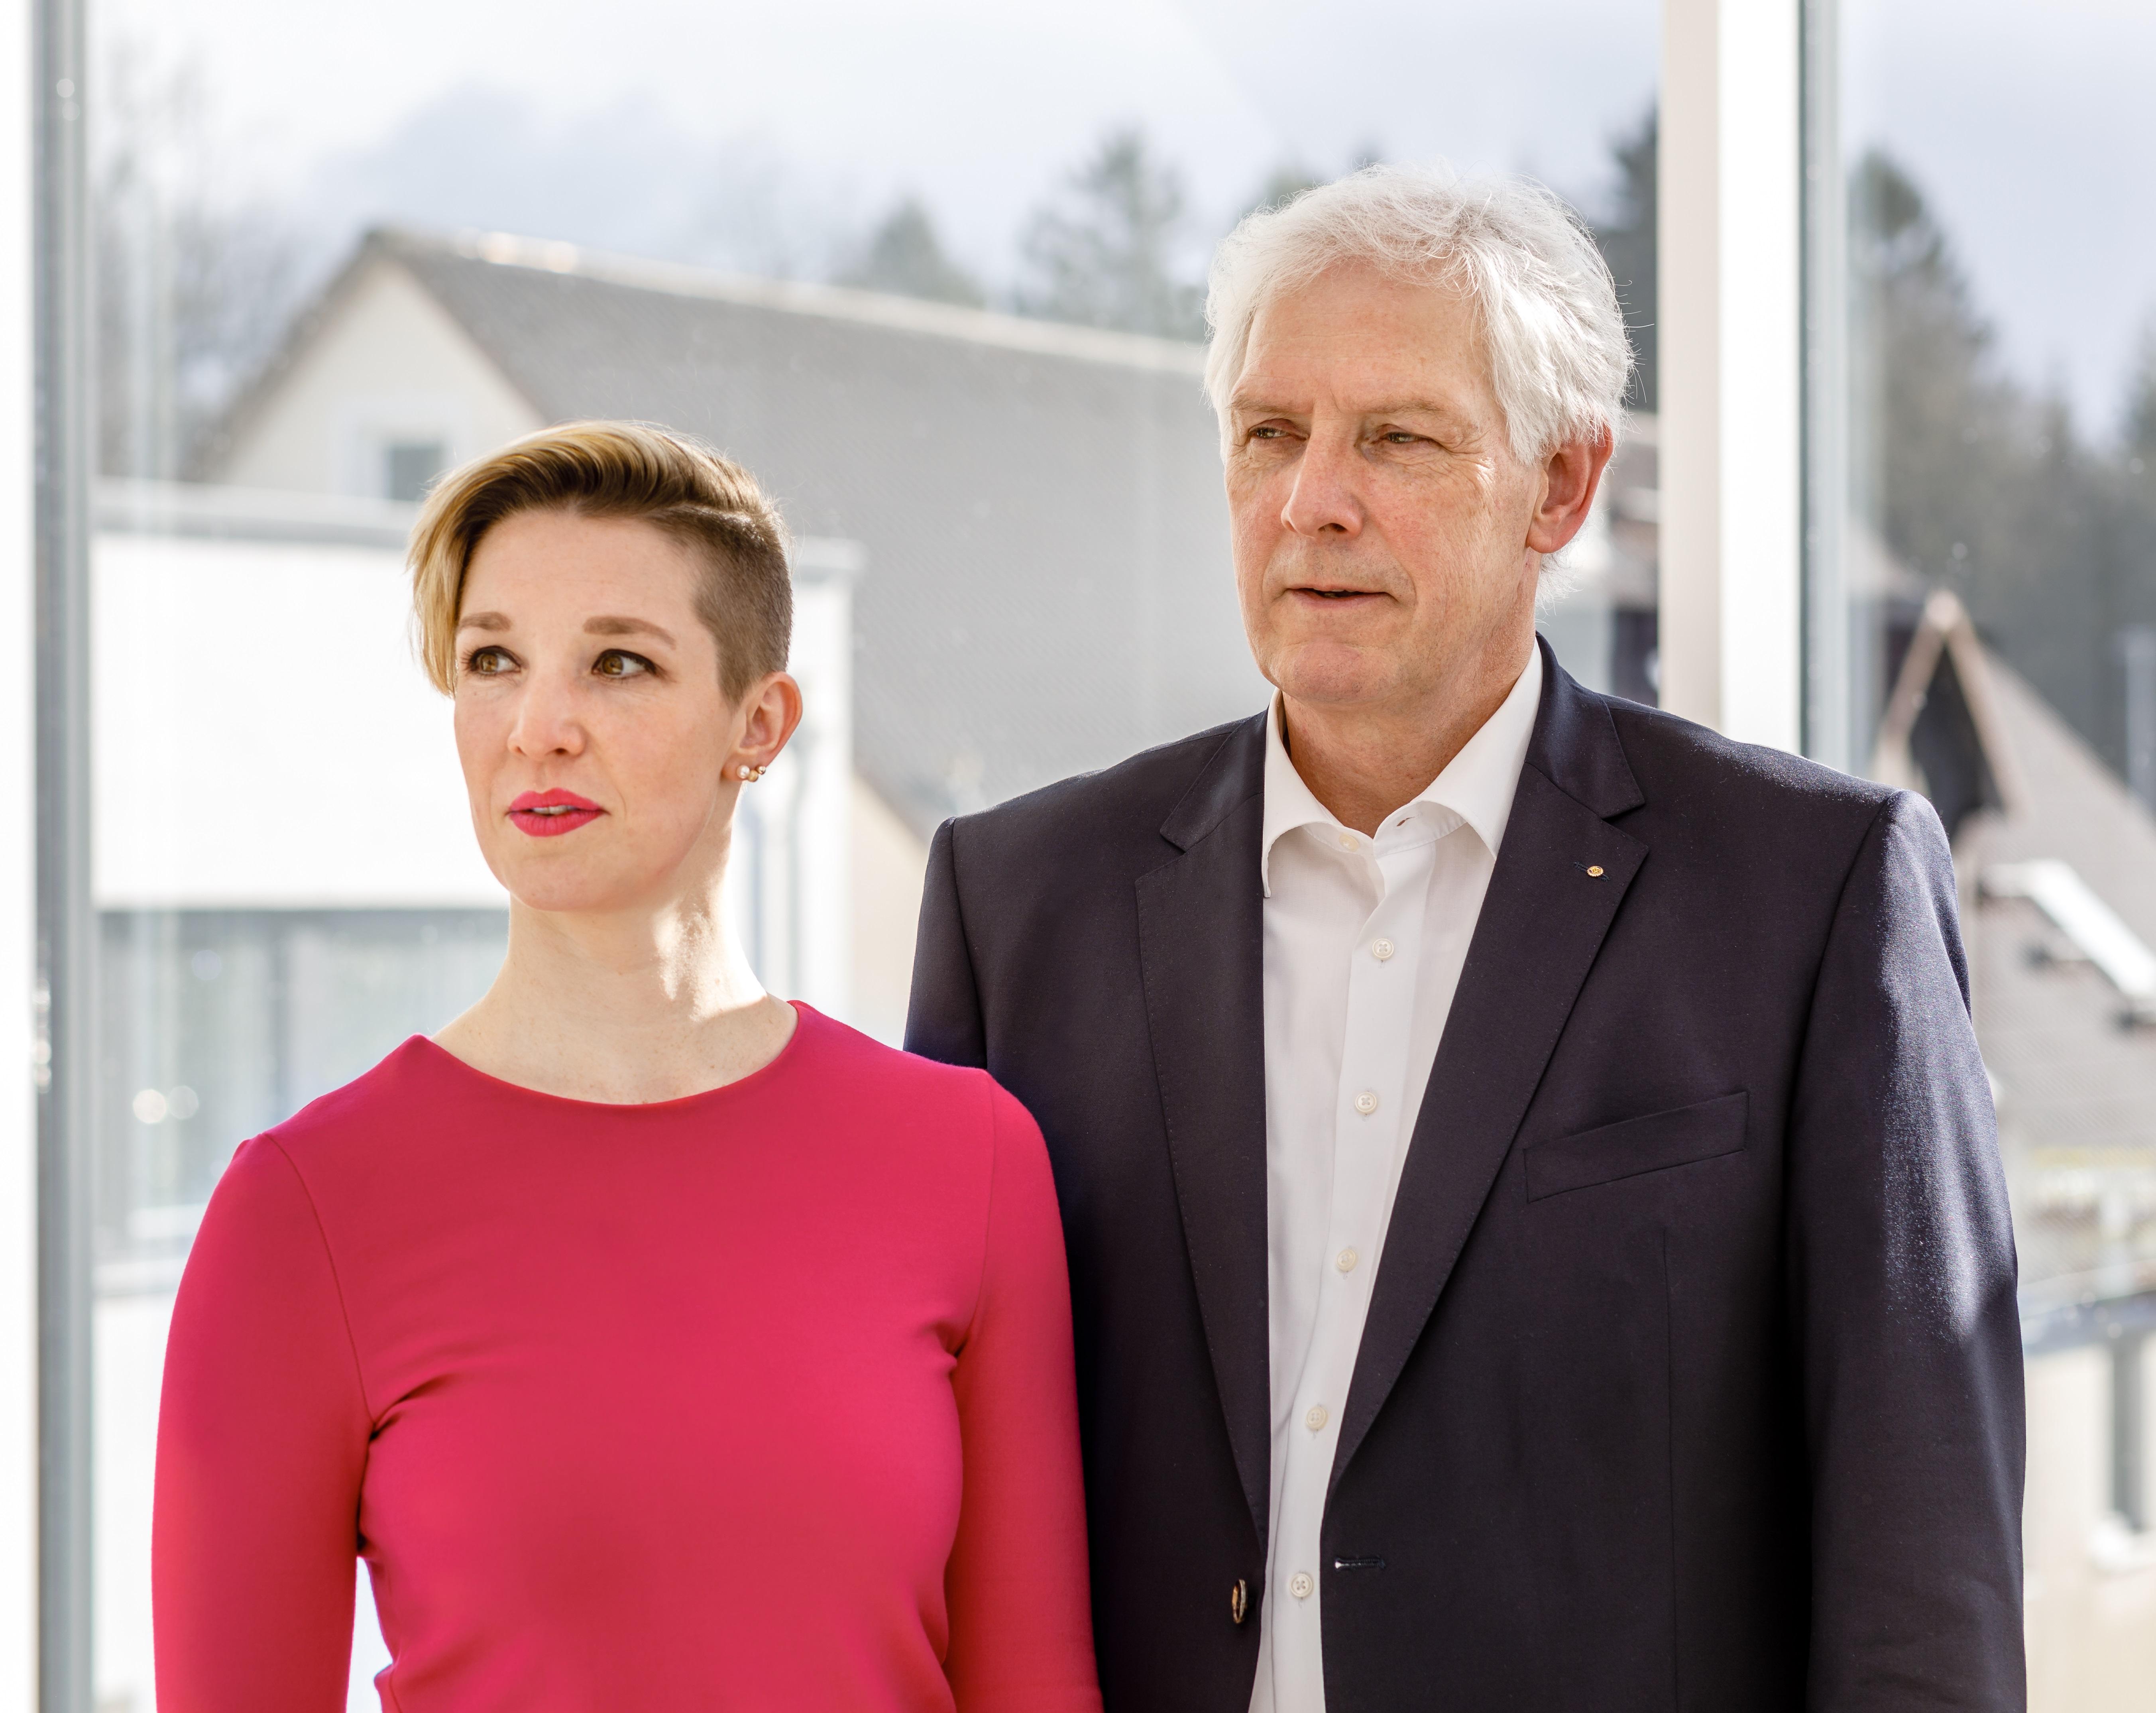 Mientje Krüger und Matthias Krüger, KRÜGER - Personal Headhunting